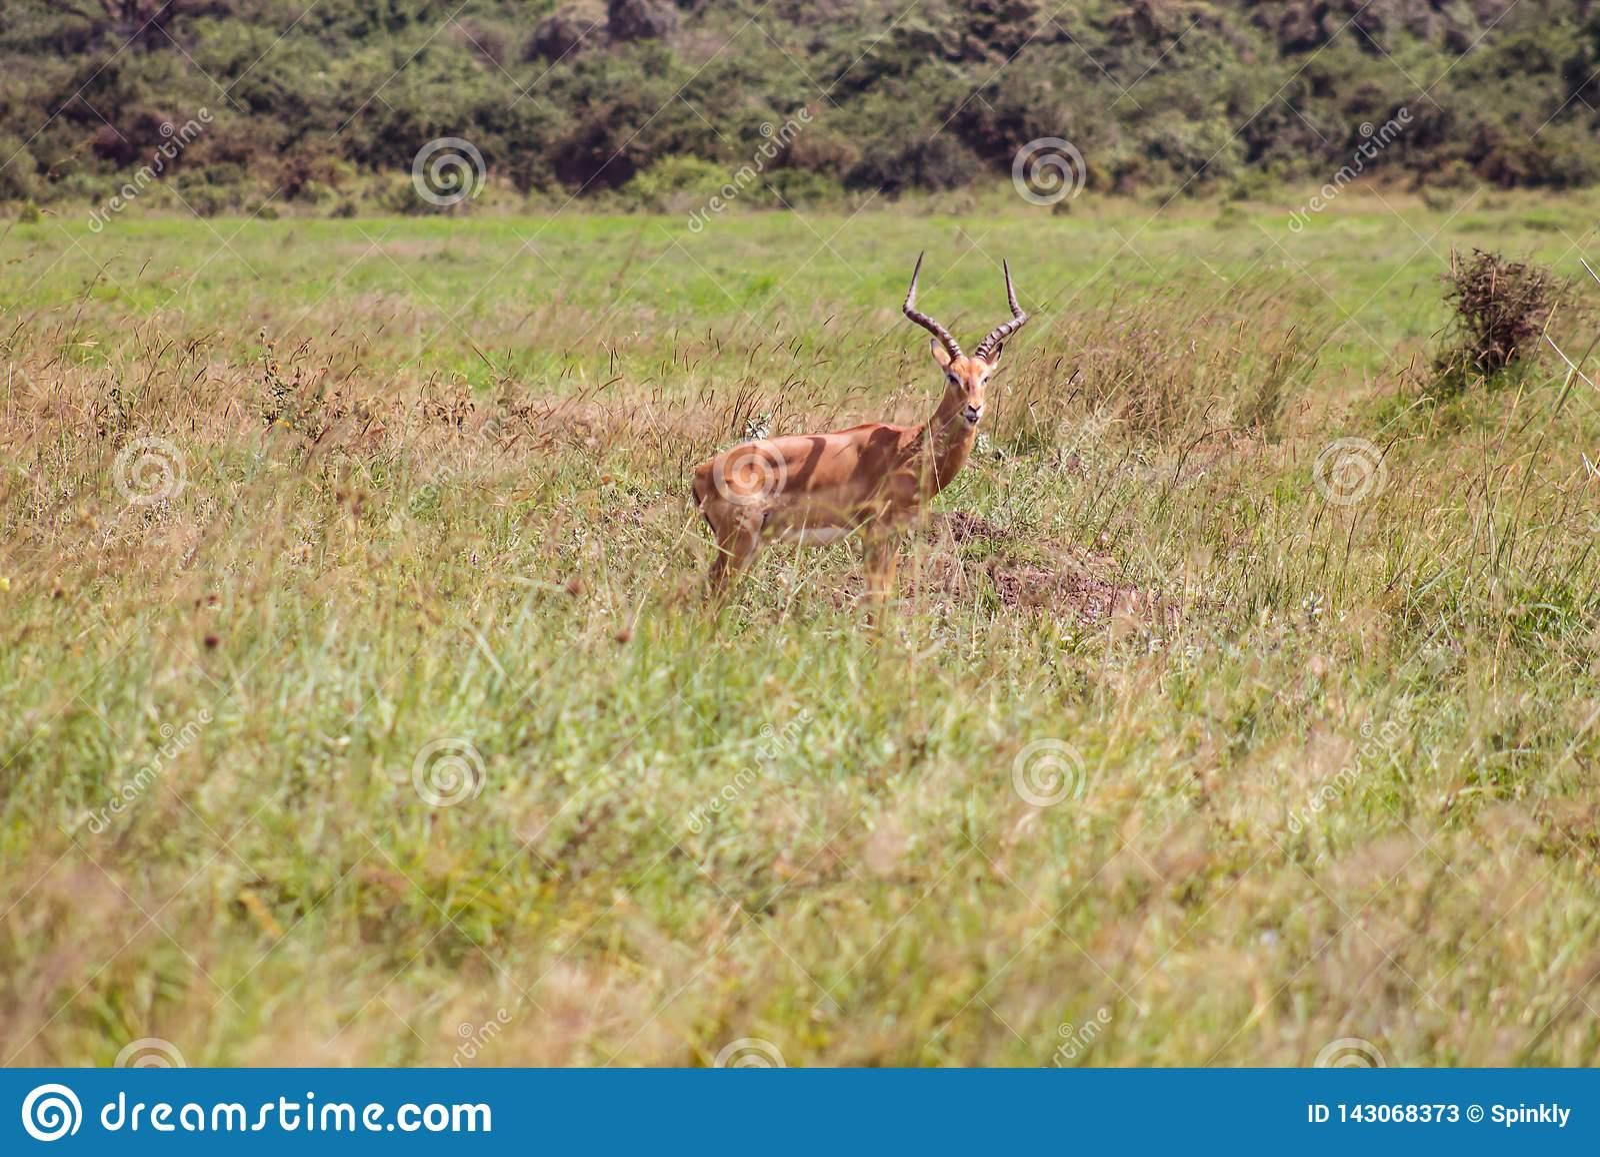 Antilope in de wildernis wordt bevlekt die